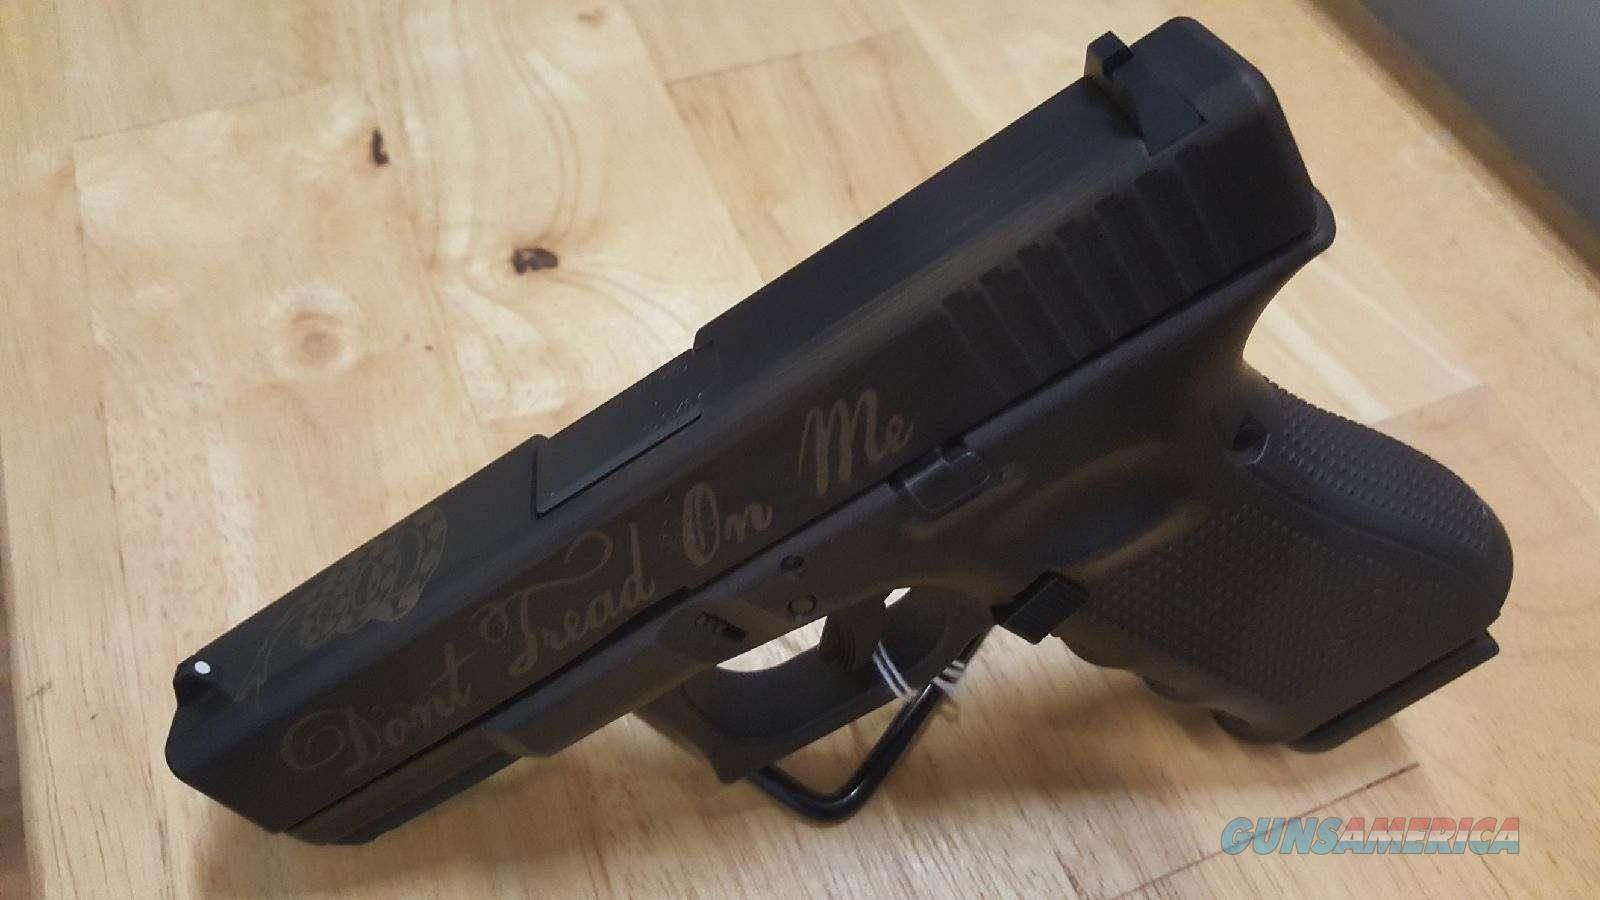 "Very Limited 9mm Glock 19 Gen 4 ""Dont Tread on Me"" - New in Box  Guns > Pistols > Glock Pistols > 19/19X"